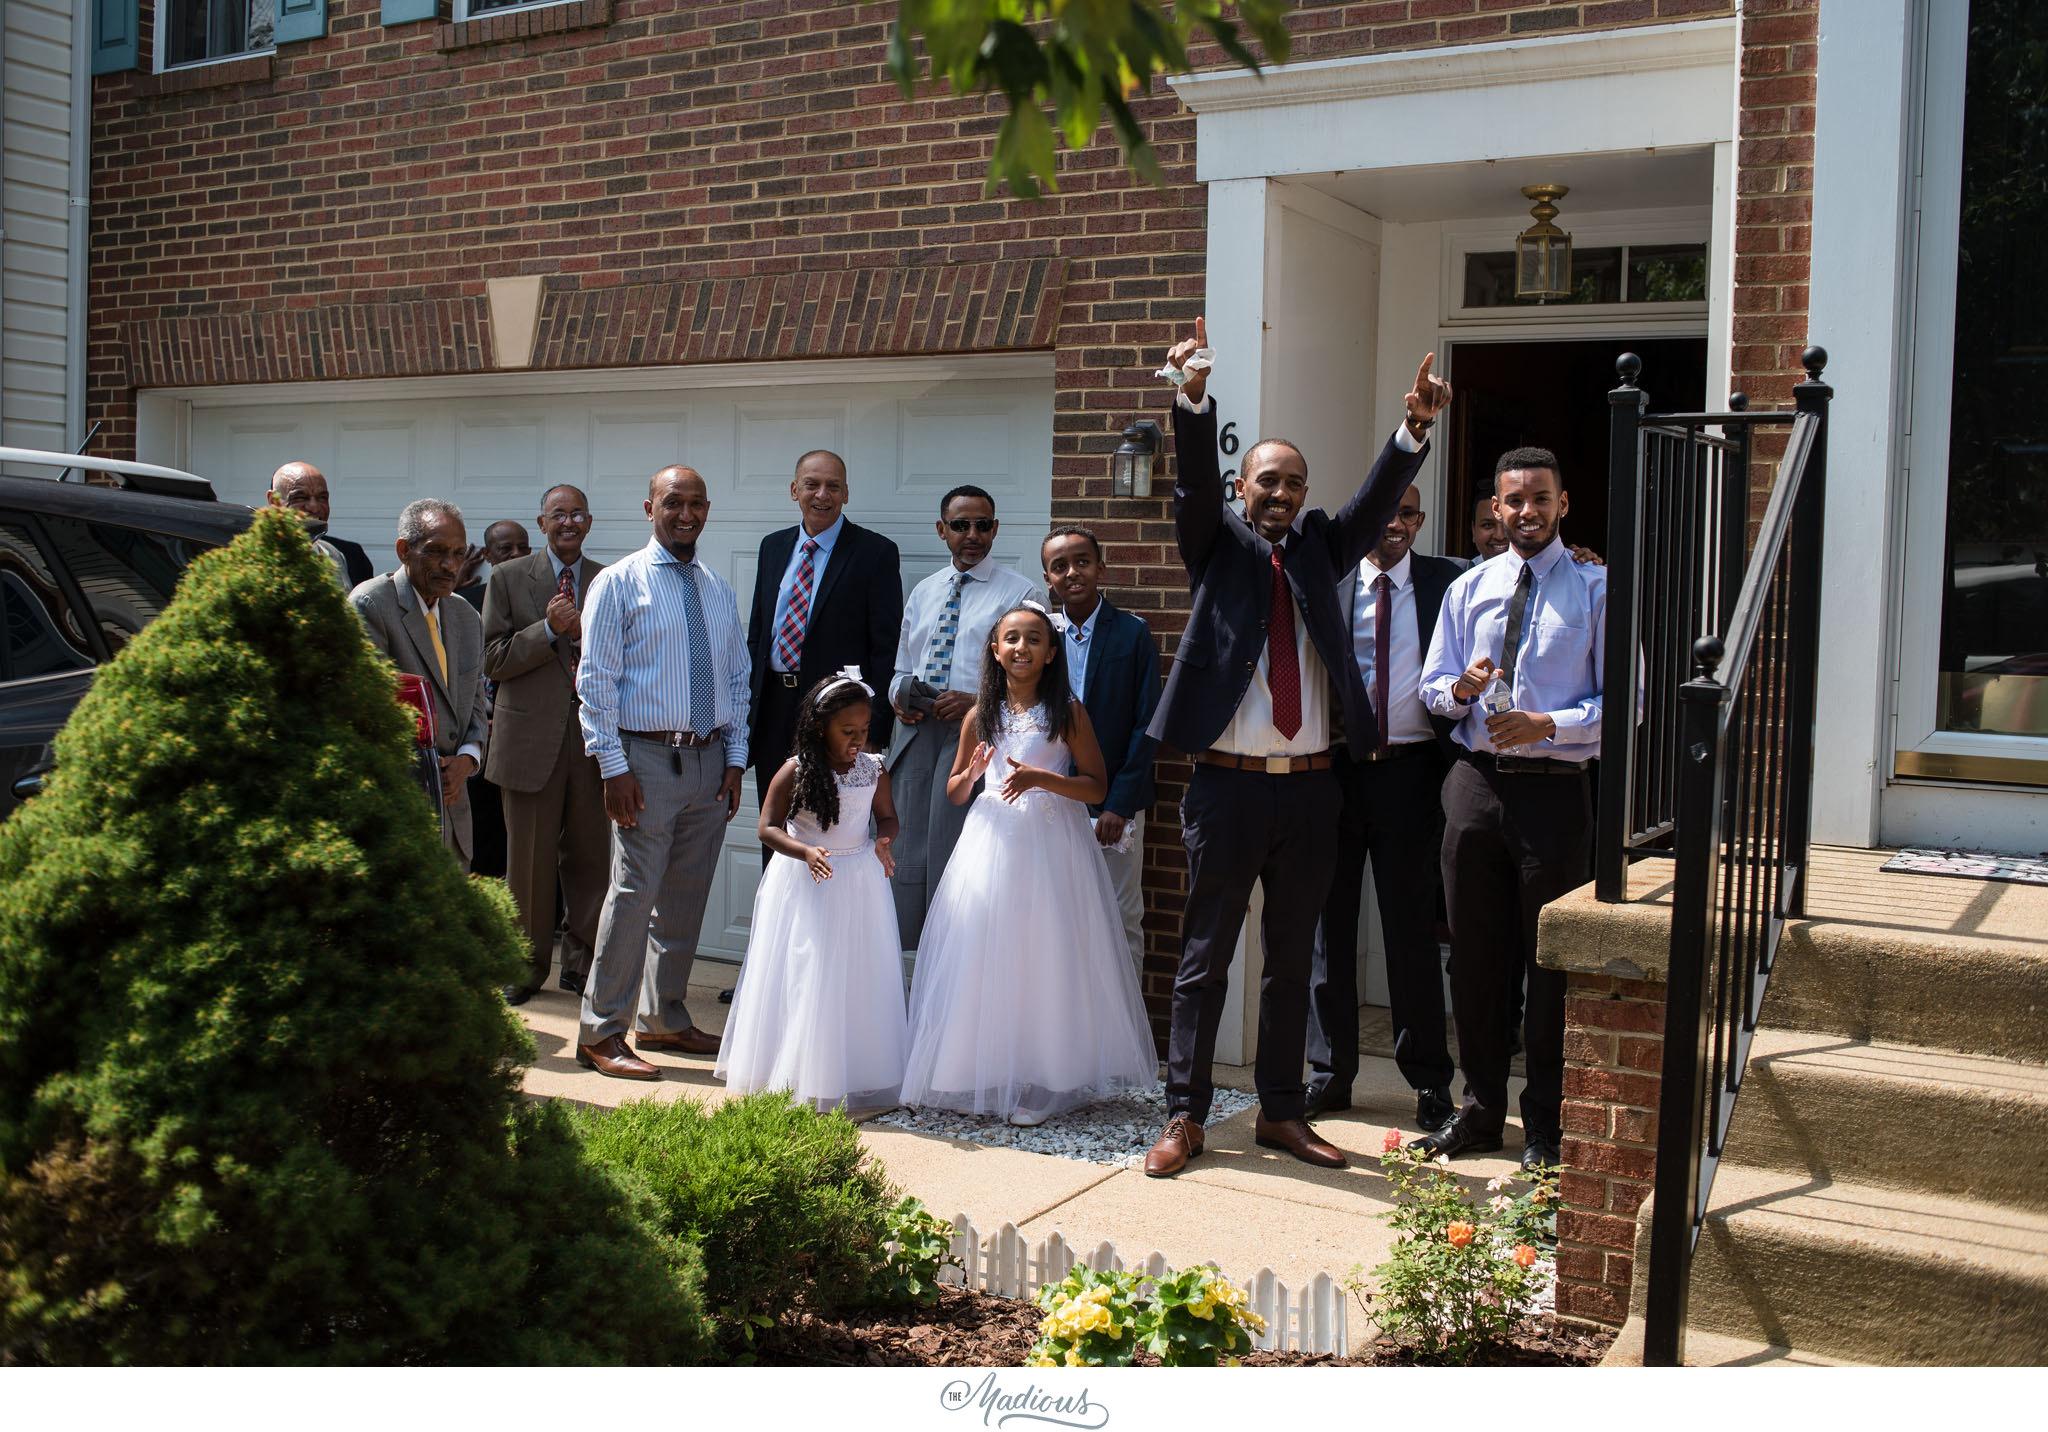 nmwa+wedding,+women+in+the+arts+wedding,+ethiopian+wedding,+dc+wedding+0046.jpg